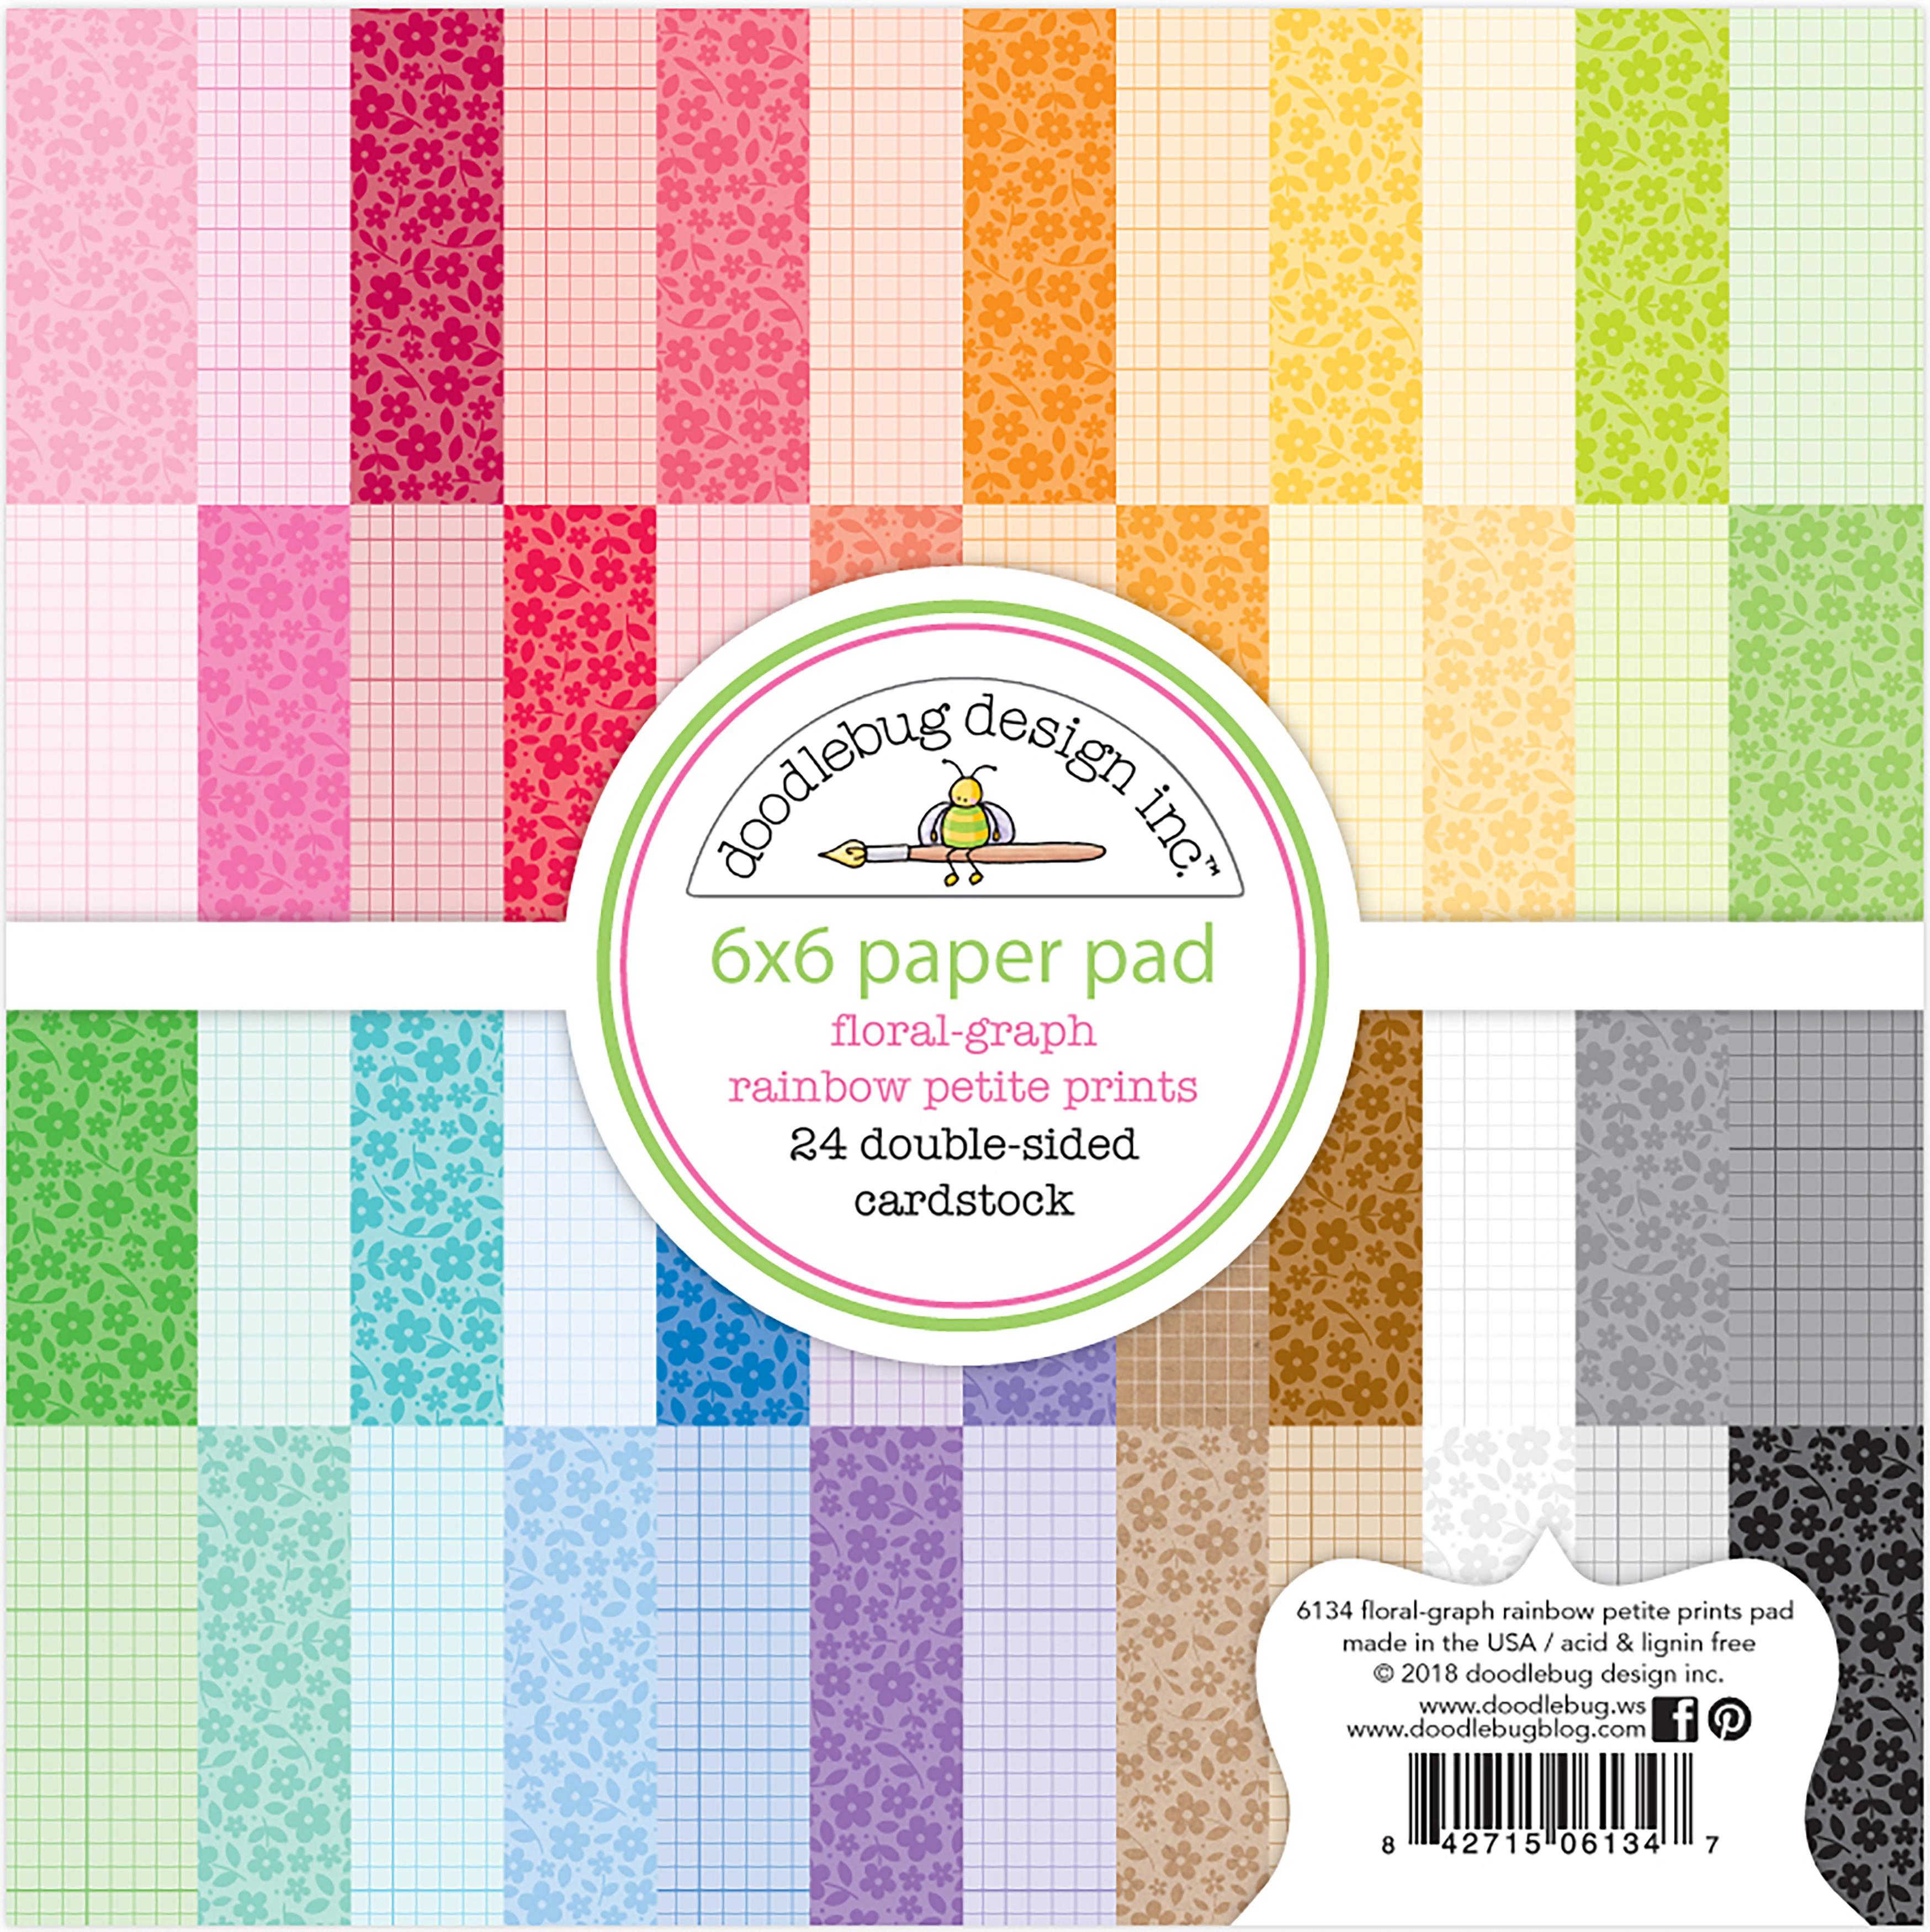 Doodlebug Petite Prints Double-Sided Paper Pad 6X6 24/Pkg-Floral-Graph Rainbow...